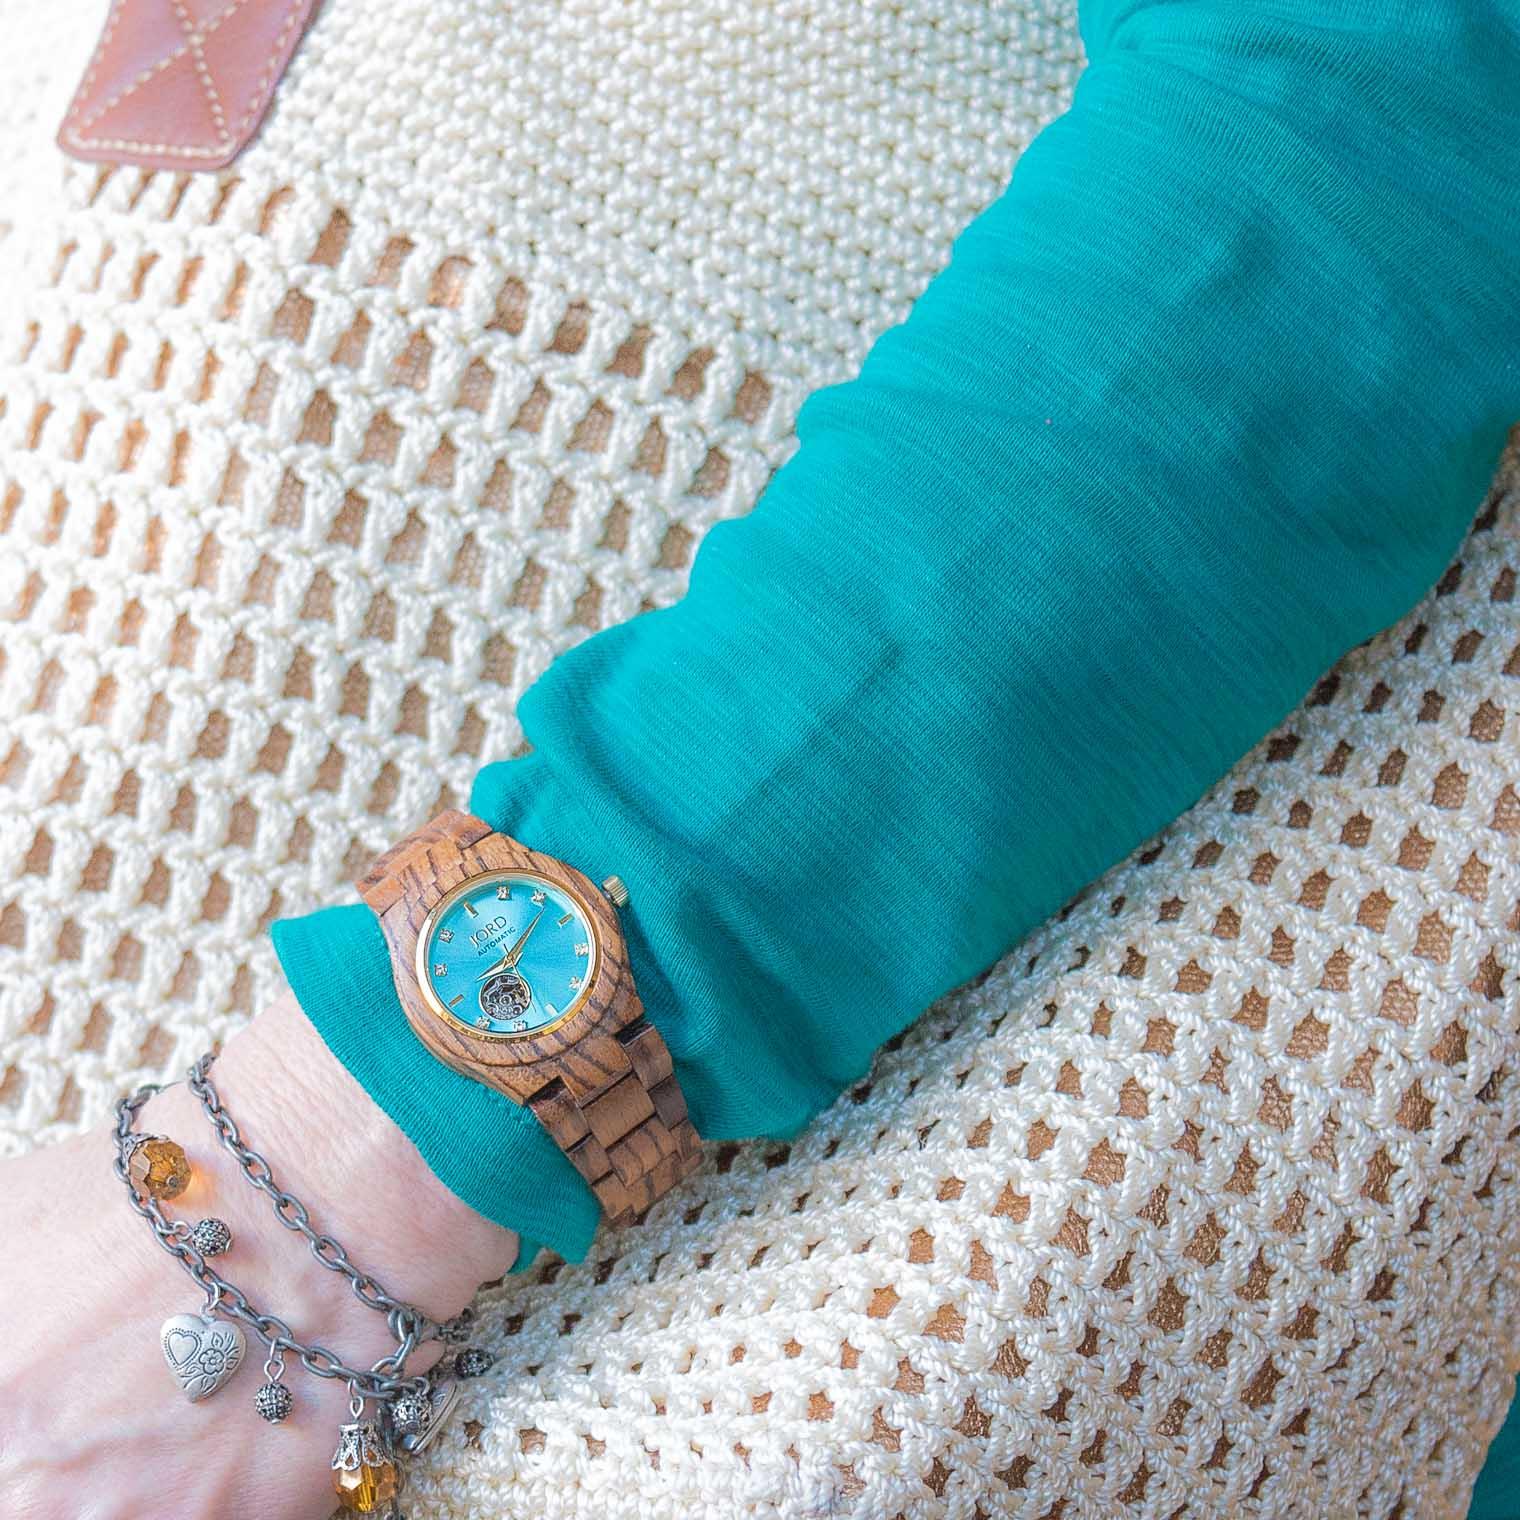 Jord Watches, Wood Watch, Women's Watch, Barb Brookbank